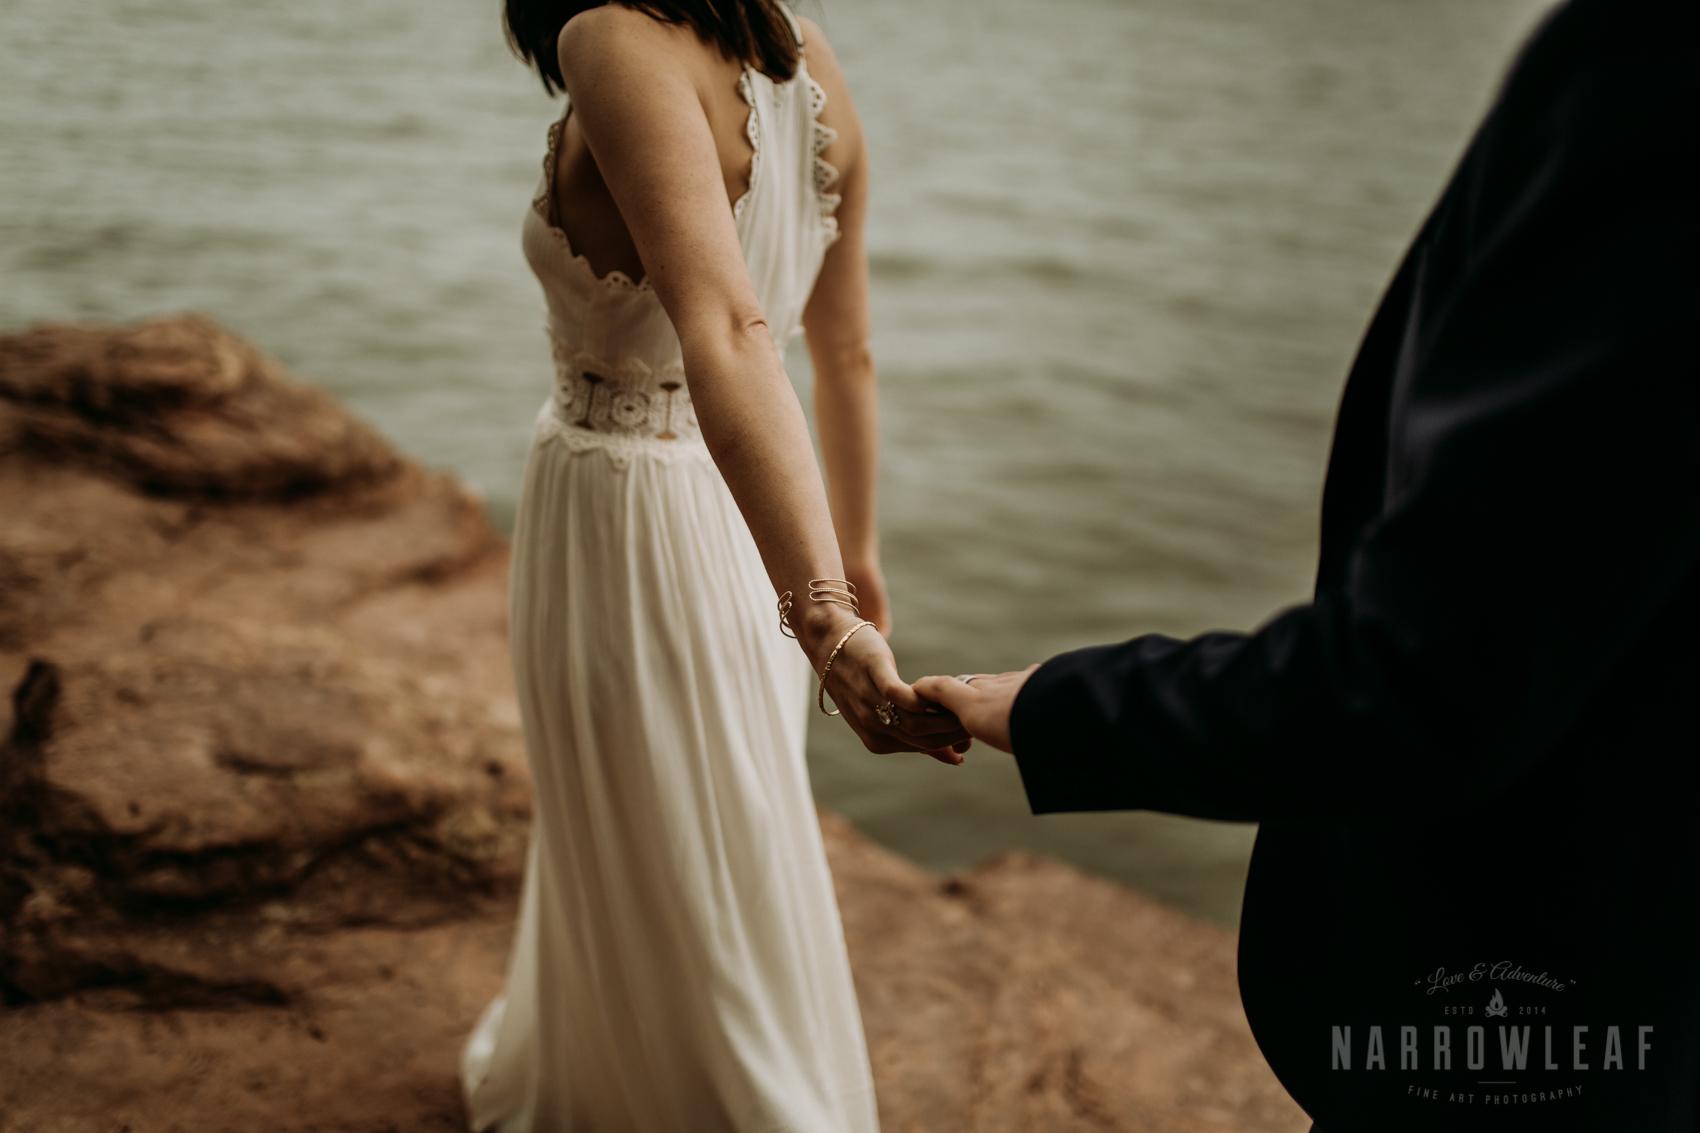 moody-lake-superior-hiking-adventure-elopement-NarrowLeaf-Photography-7326.jpg